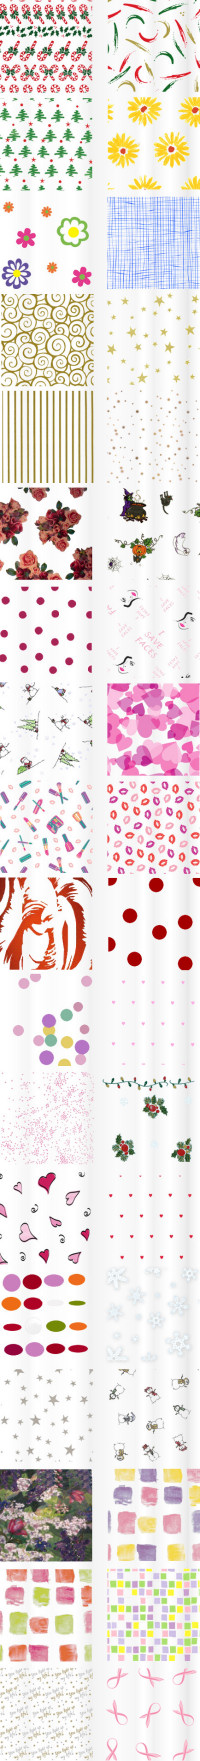 Cellophane Roll Designs 24 x 100